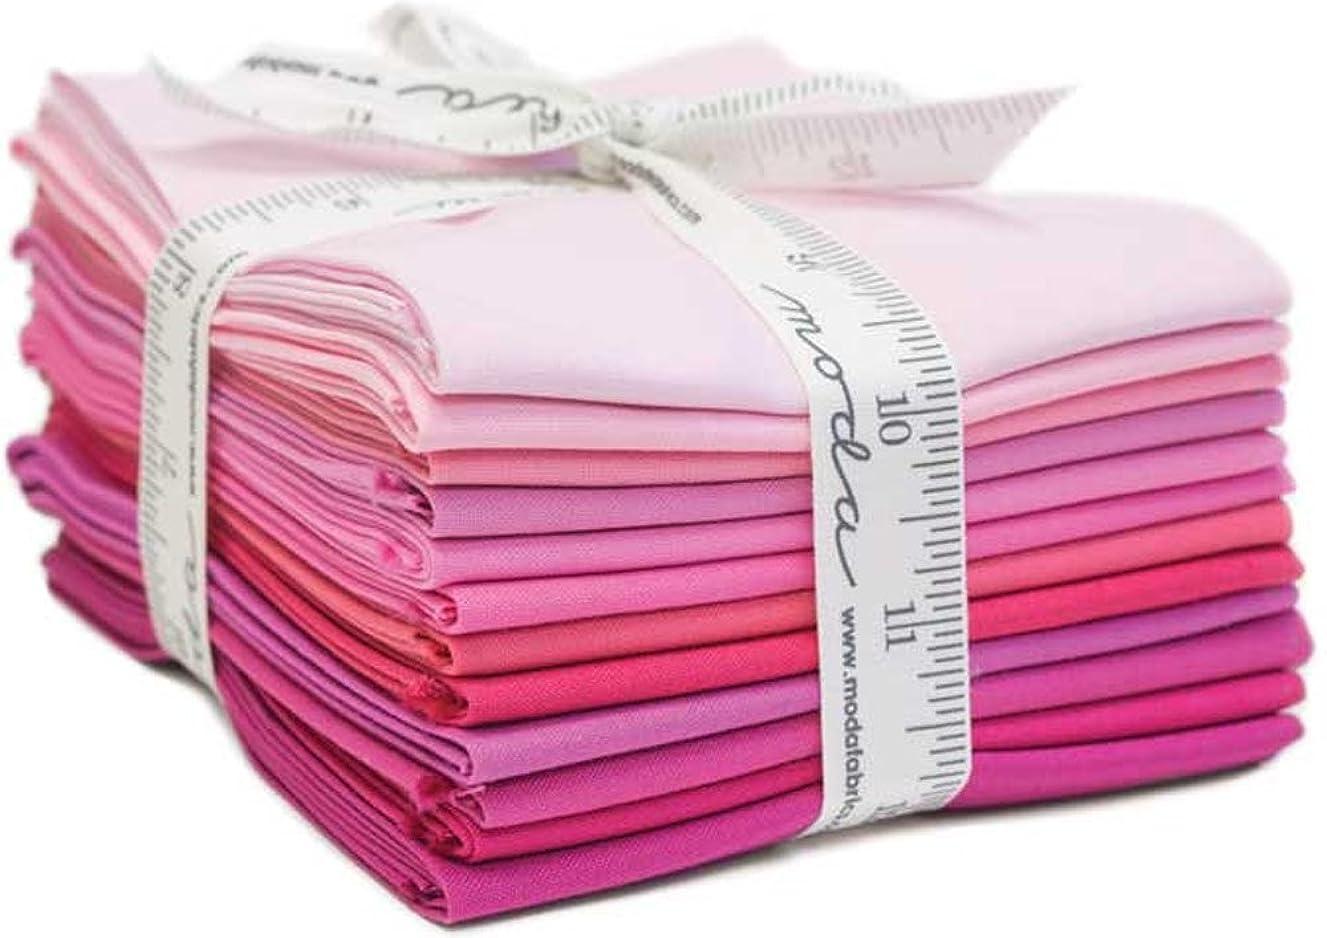 Bella Solids Pinks 12 Fat Quarters Moda Fabrics 9900AB 125